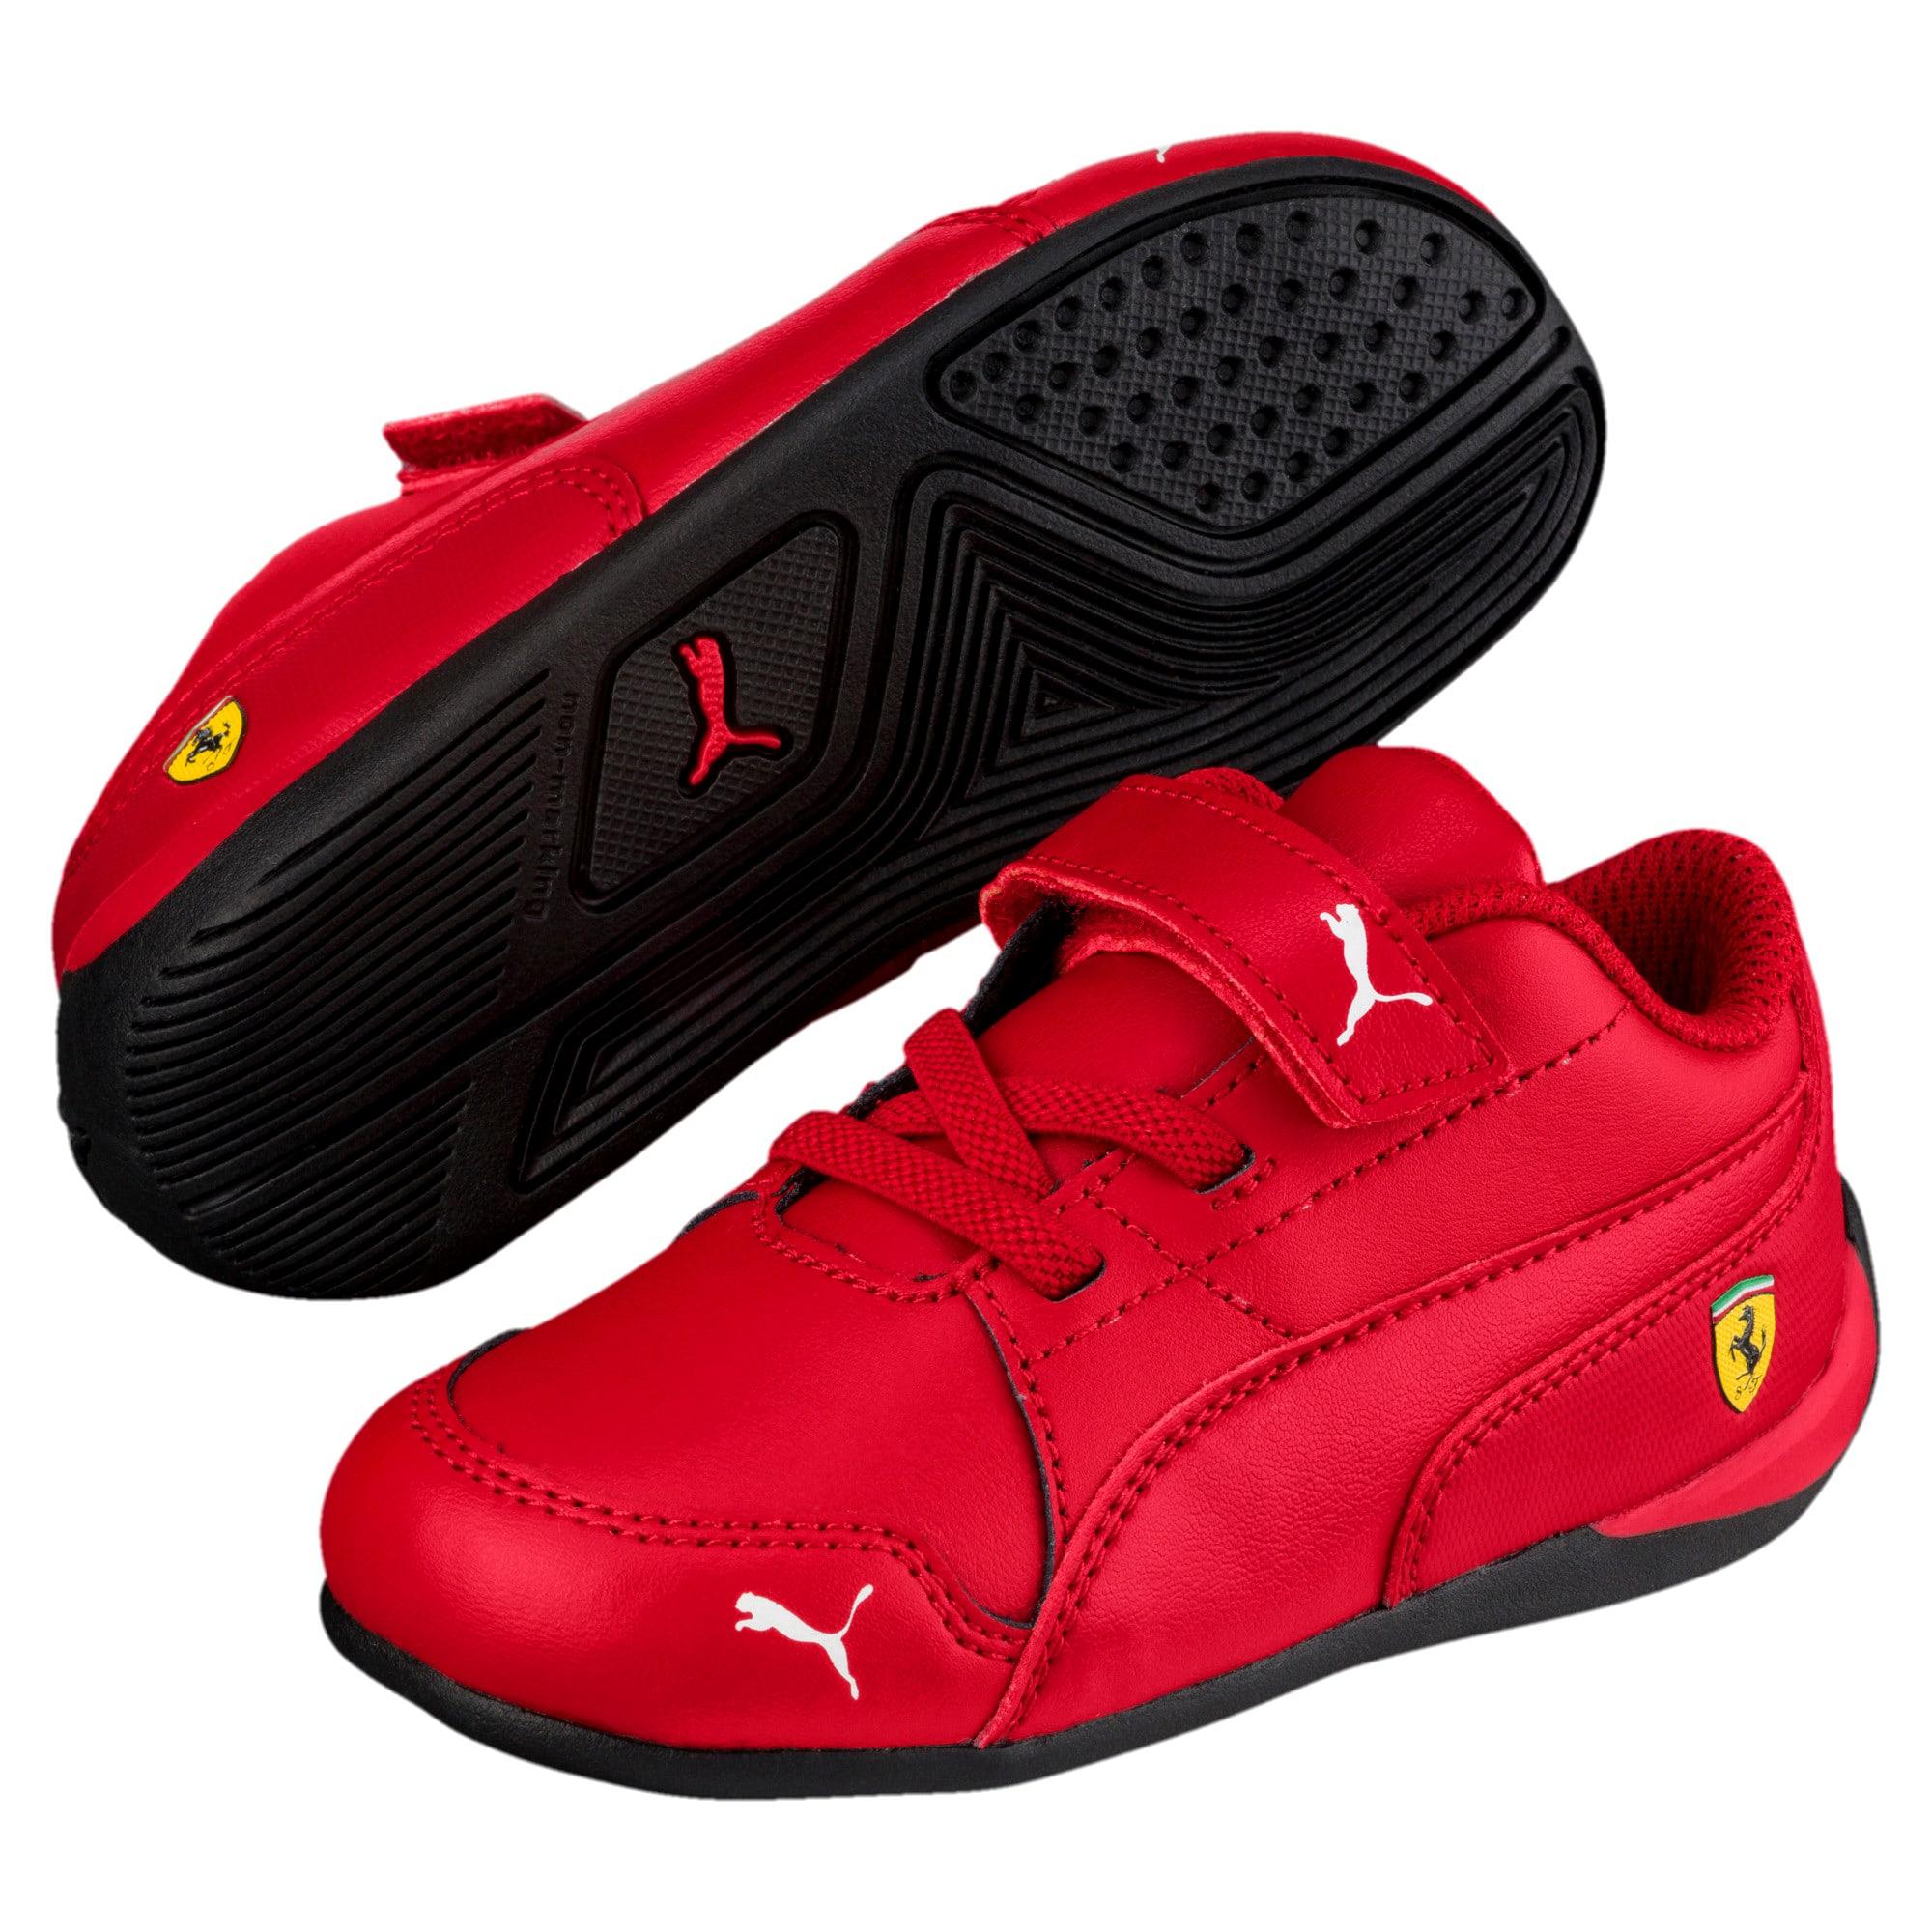 Thumbnail 2 of Ferrari Drift Cat 7 V Kinder Sneaker, Rosso Corsa-Rosso Corsa, medium